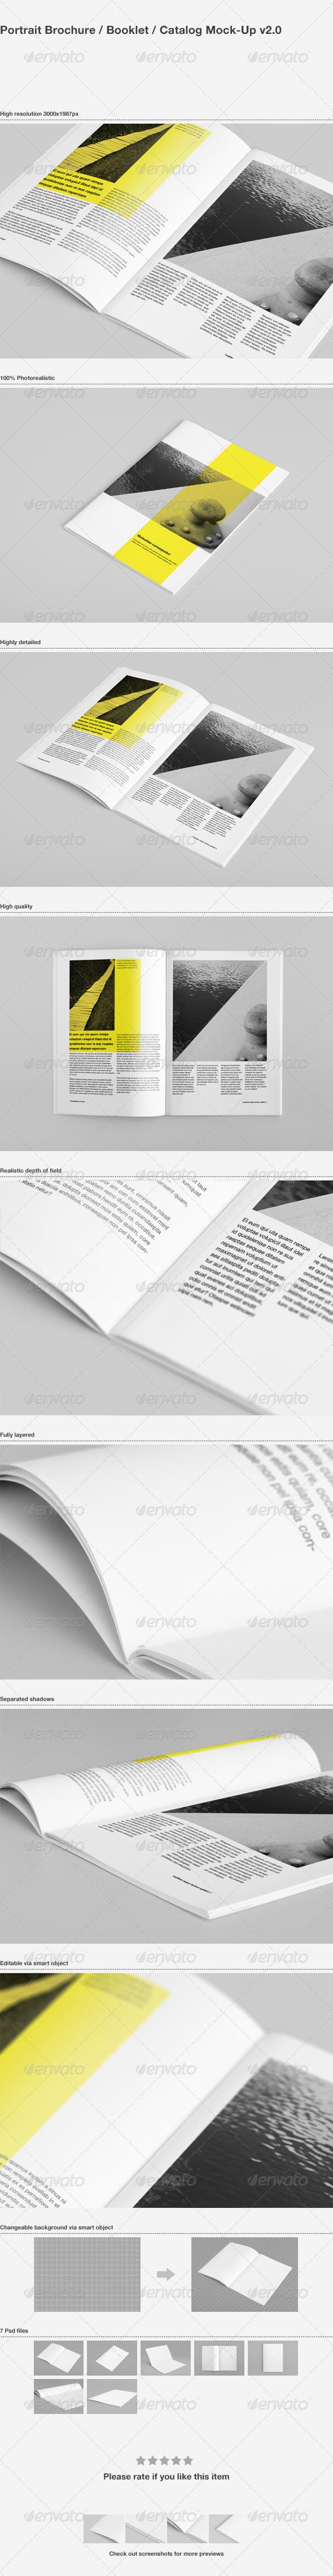 Brochure / Booklet / Catalog Mock-Up - Brochures Print